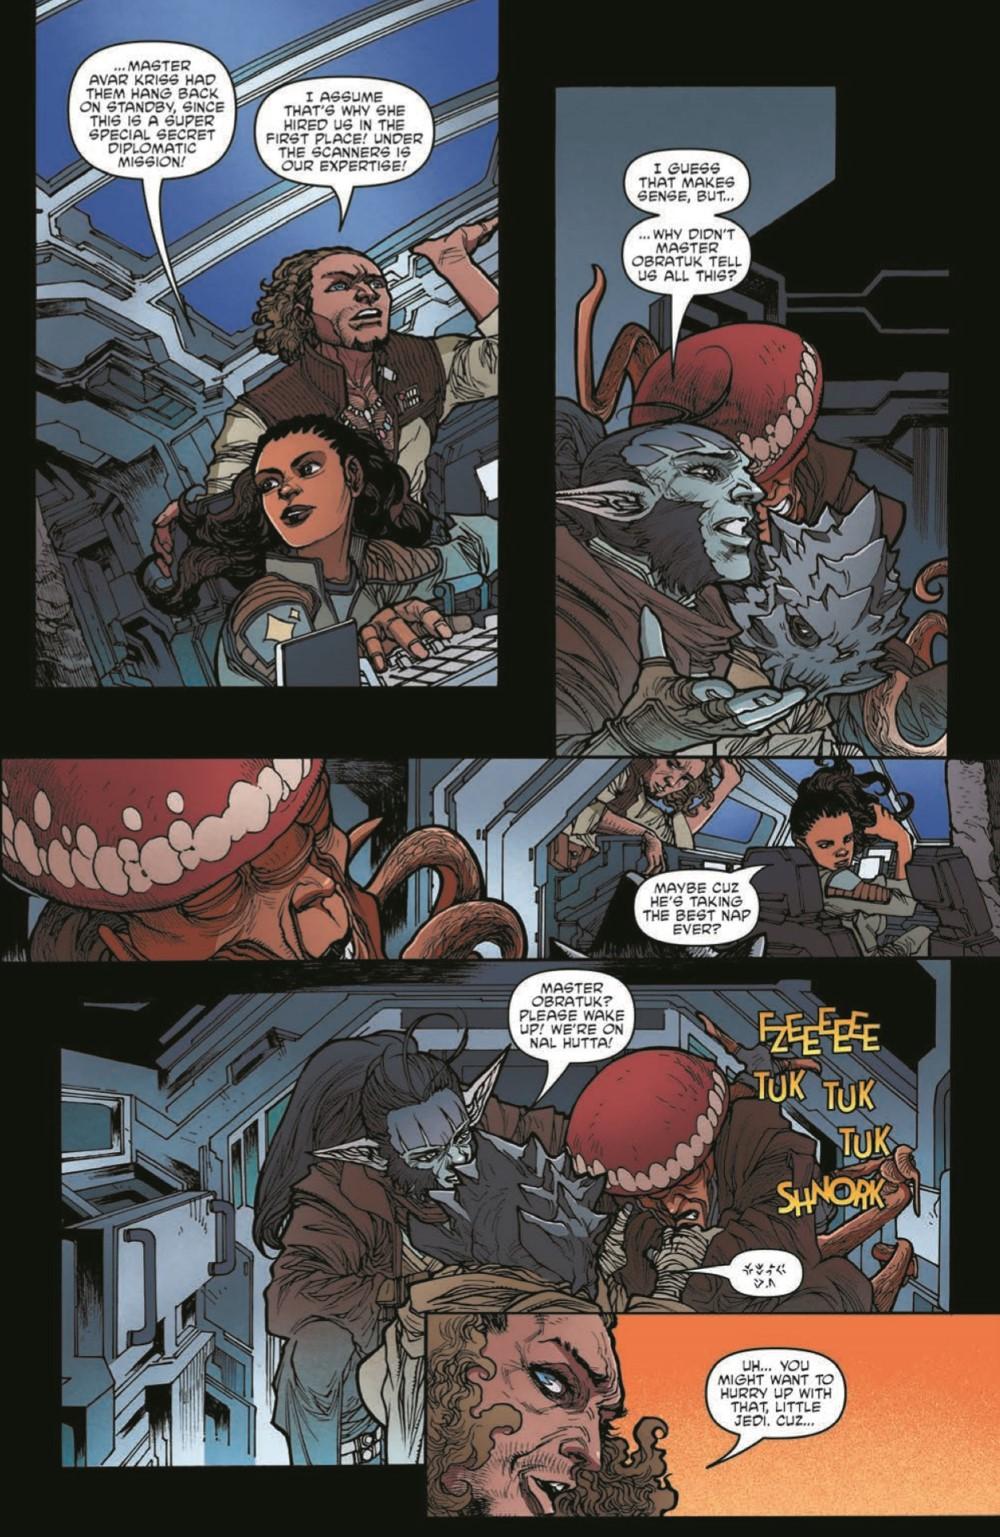 SWAHRA06-pr-5 ComicList Previews: STAR WARS THE HIGH REPUBLIC ADVENTURES #6